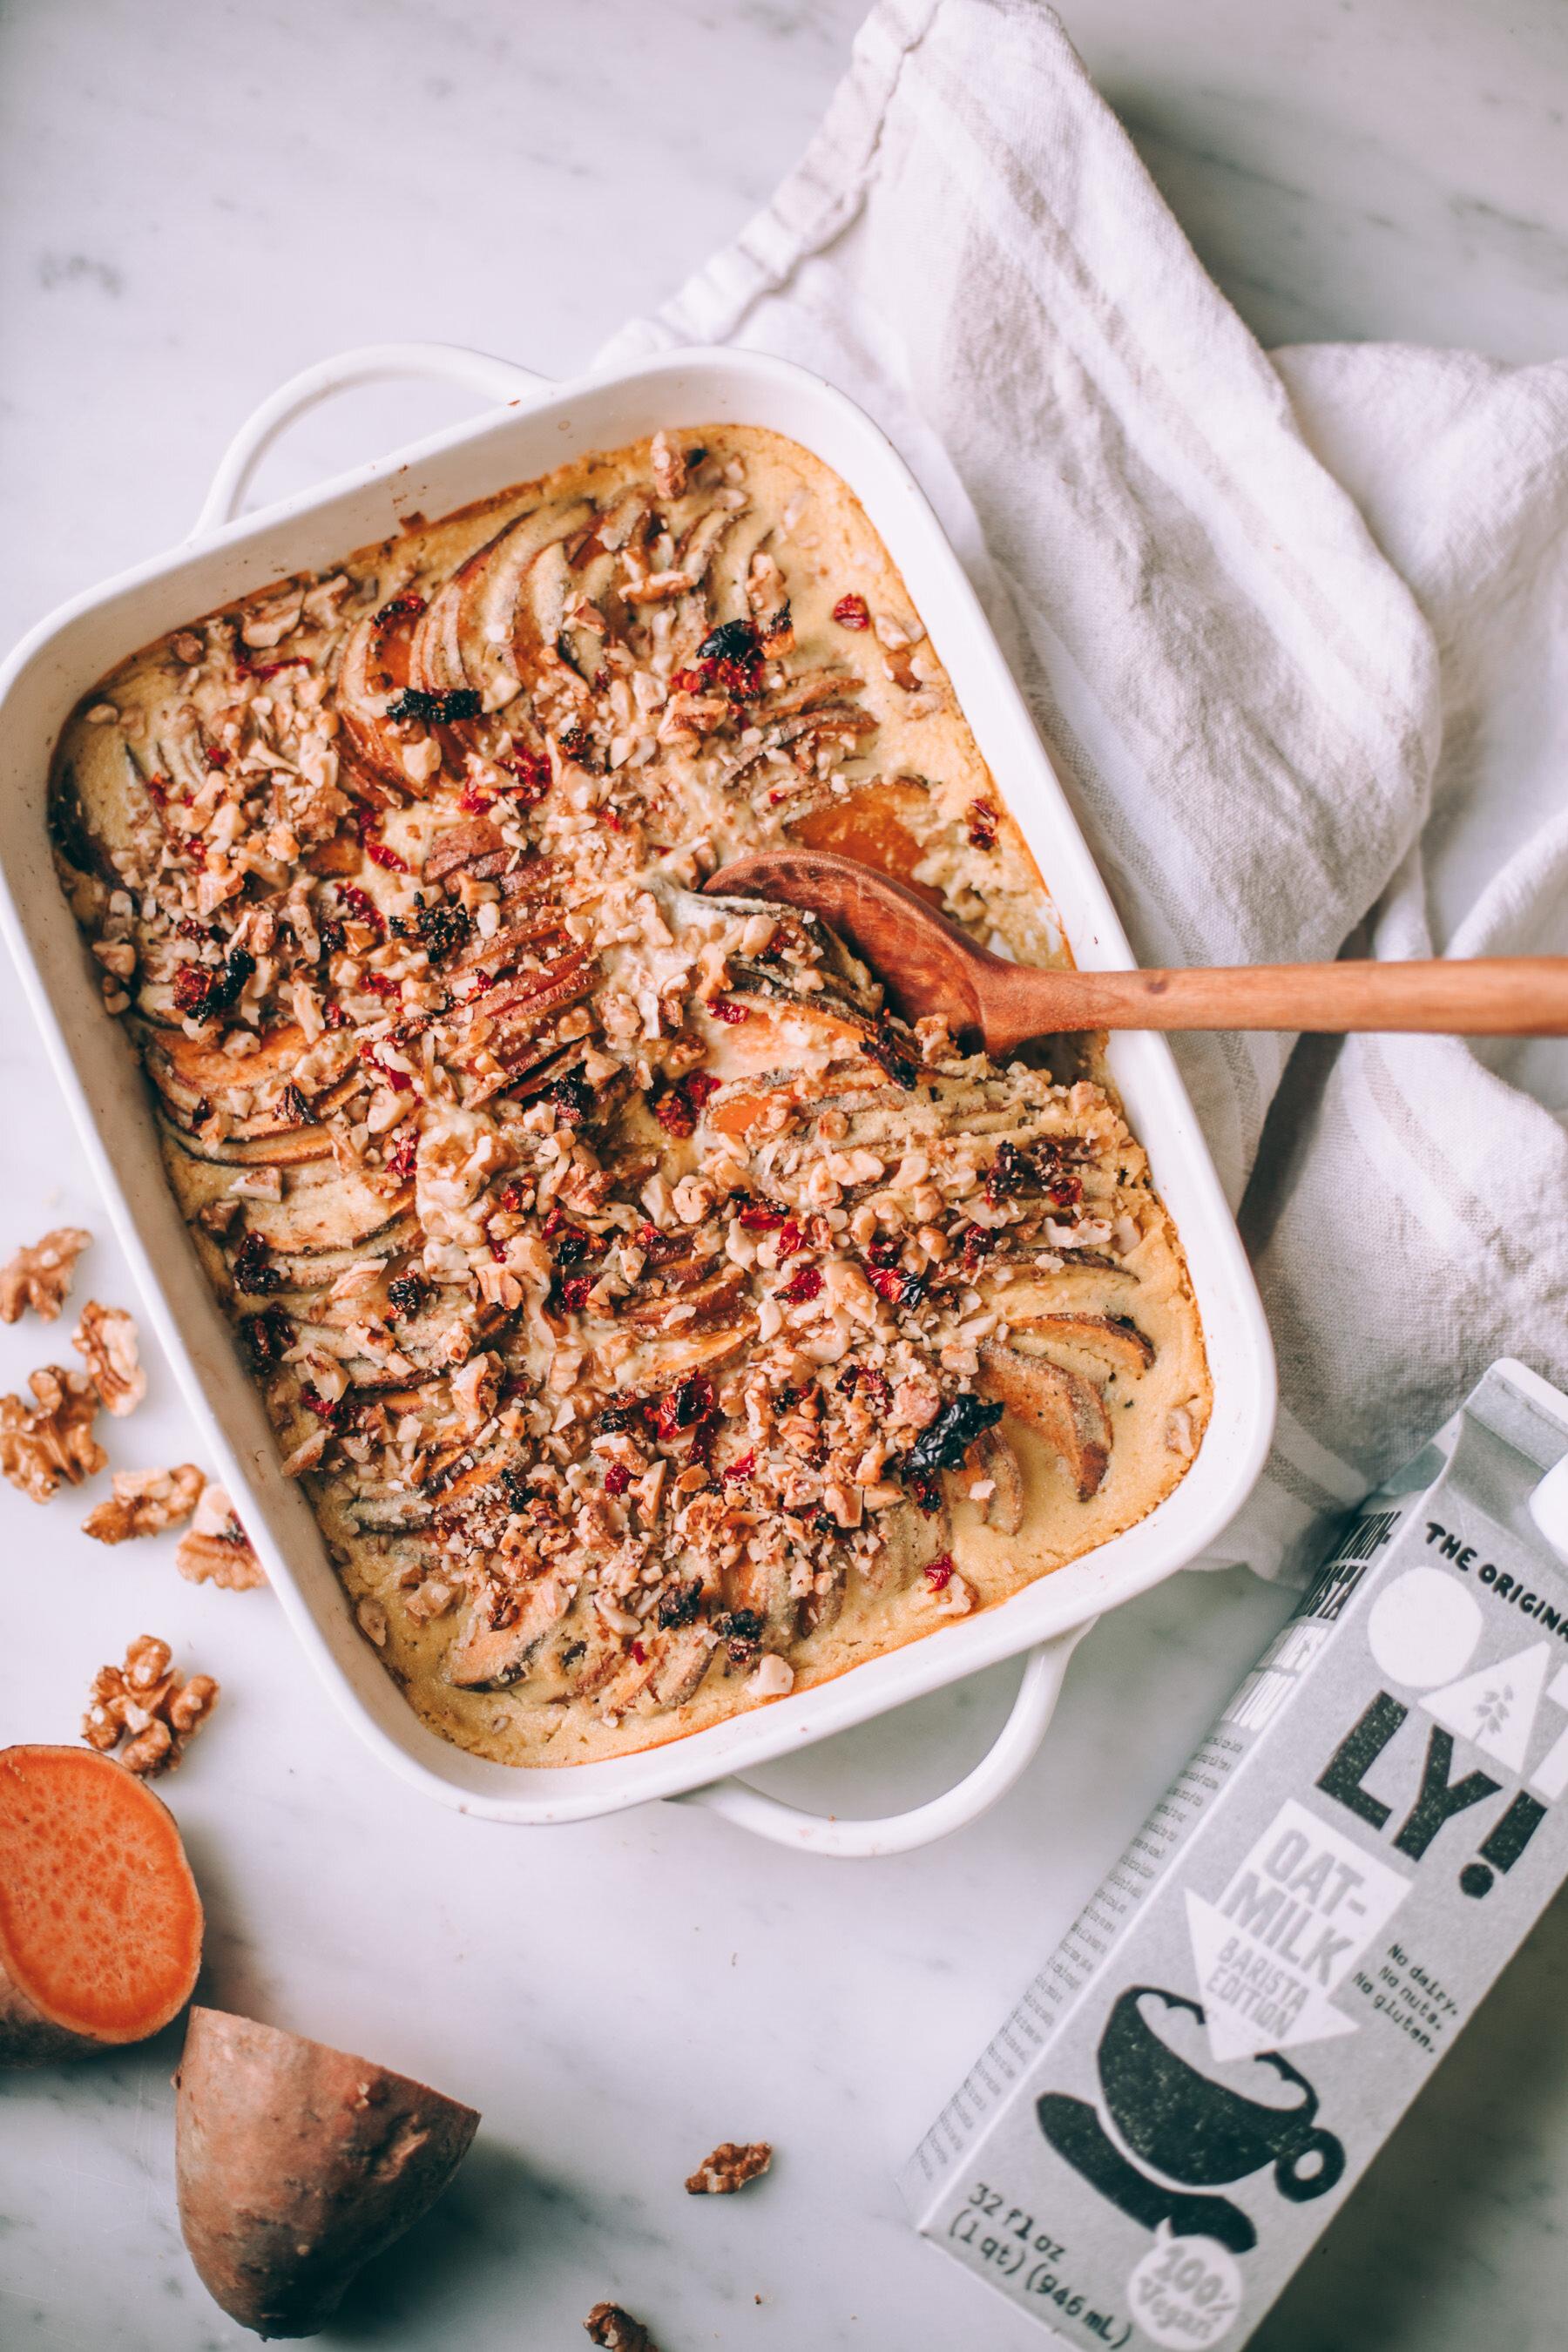 vegan sweet potato gratin made with Oatly oat milk - Recipe via will frolic for food